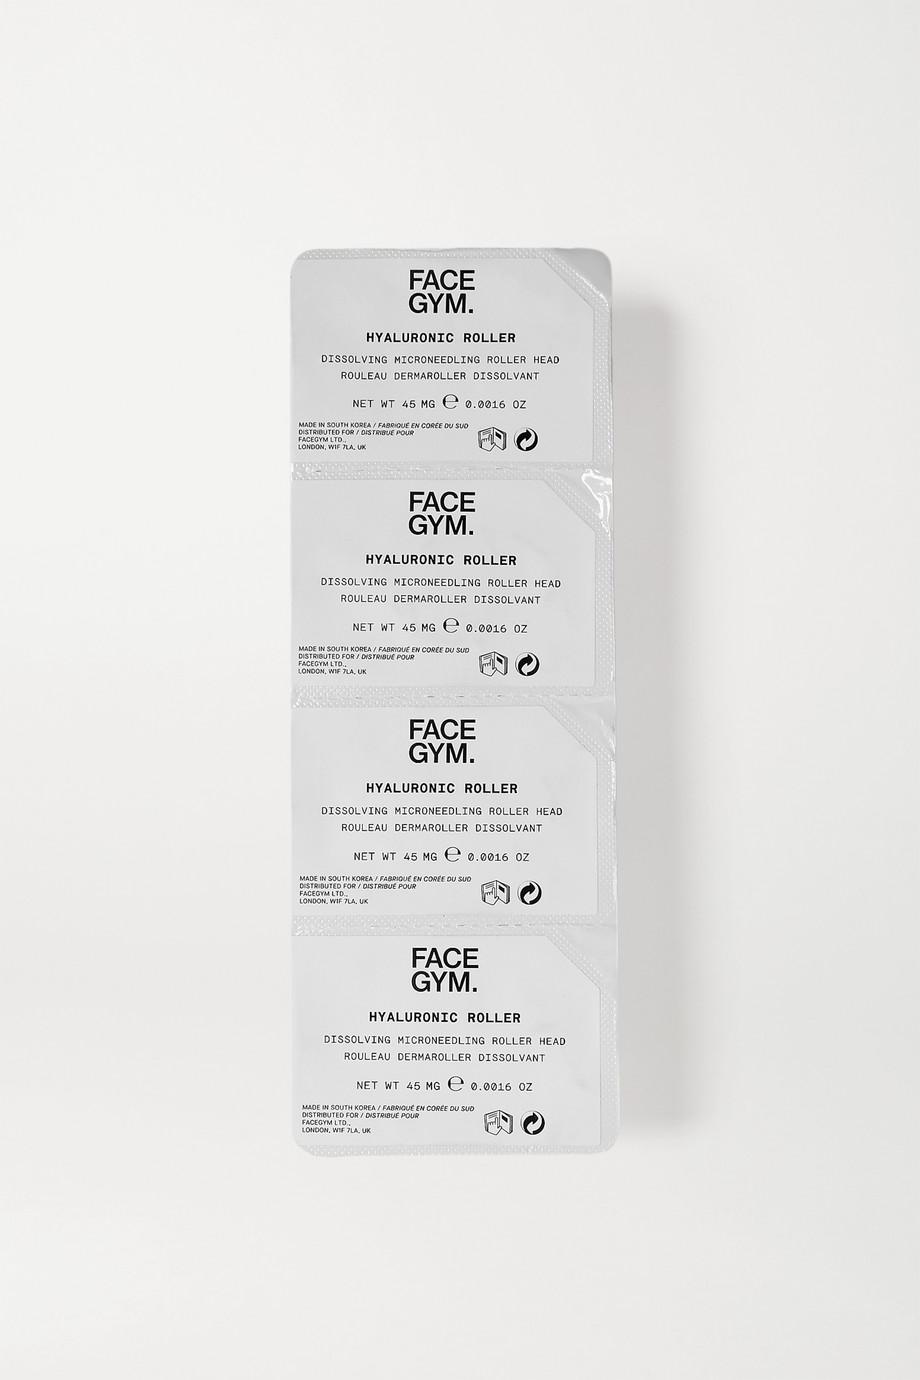 FaceGym Hyaluronic Roller Dissolving Microneedling Tool Refill – Nachfüll-Microneedling-Aufsatzköpfe